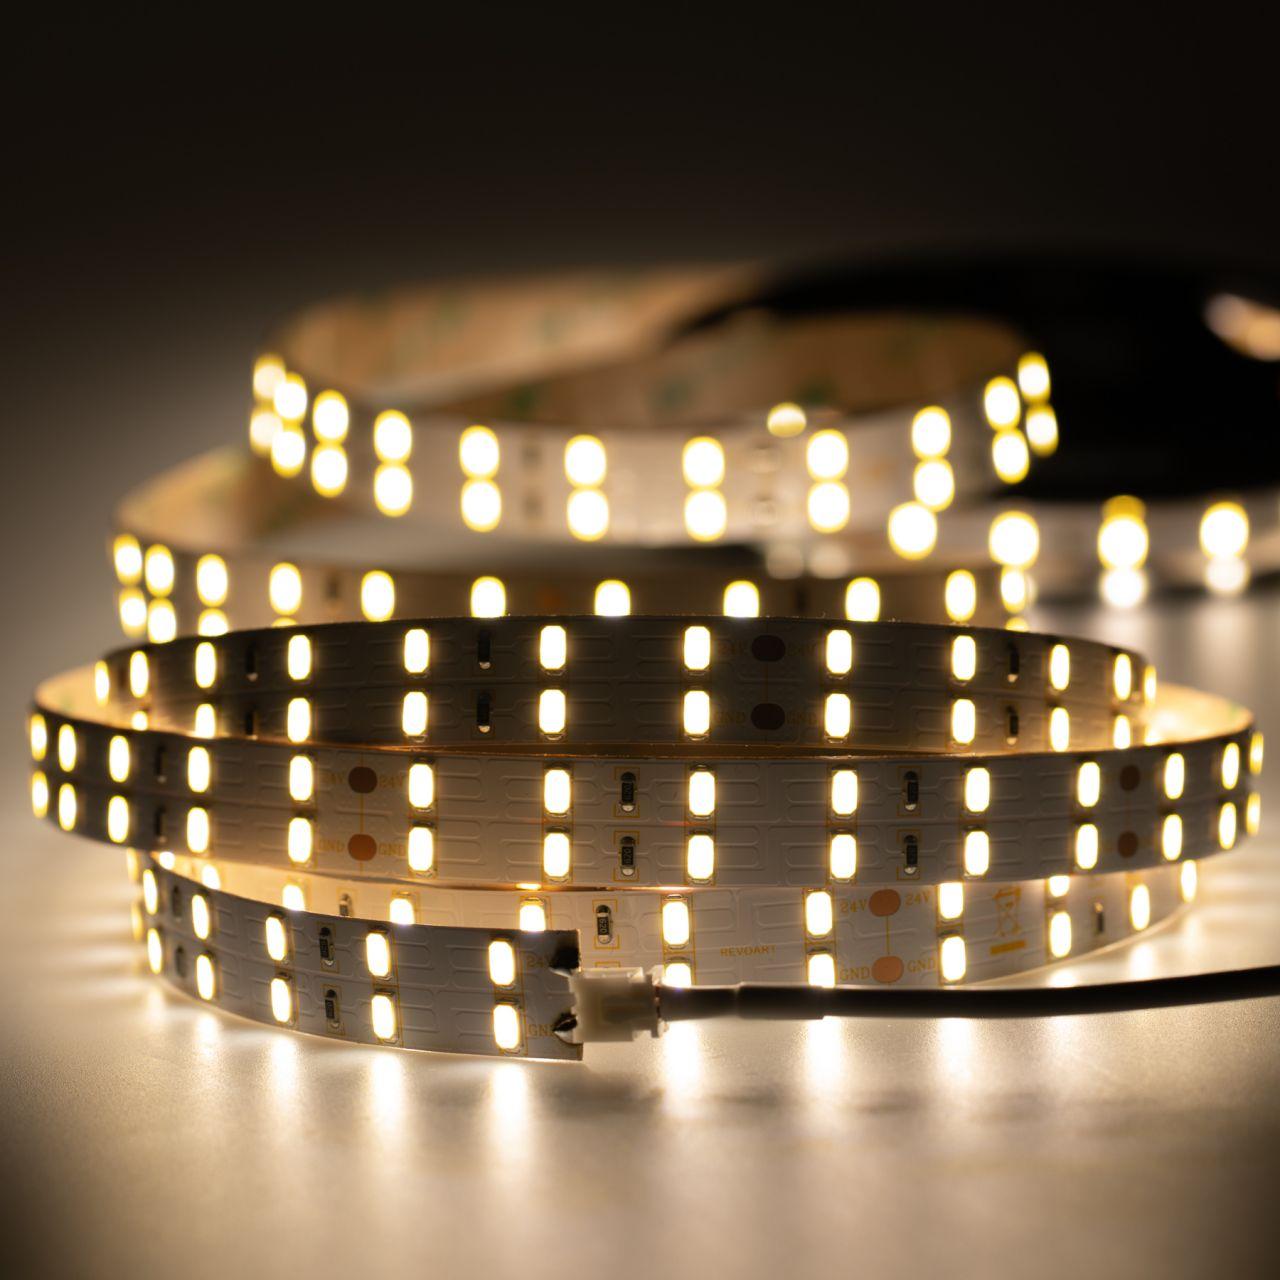 24V Double Line High-Power LED Streifen – tageslichtweiß – 120 LEDs je Meter – alle 10cm teilbar